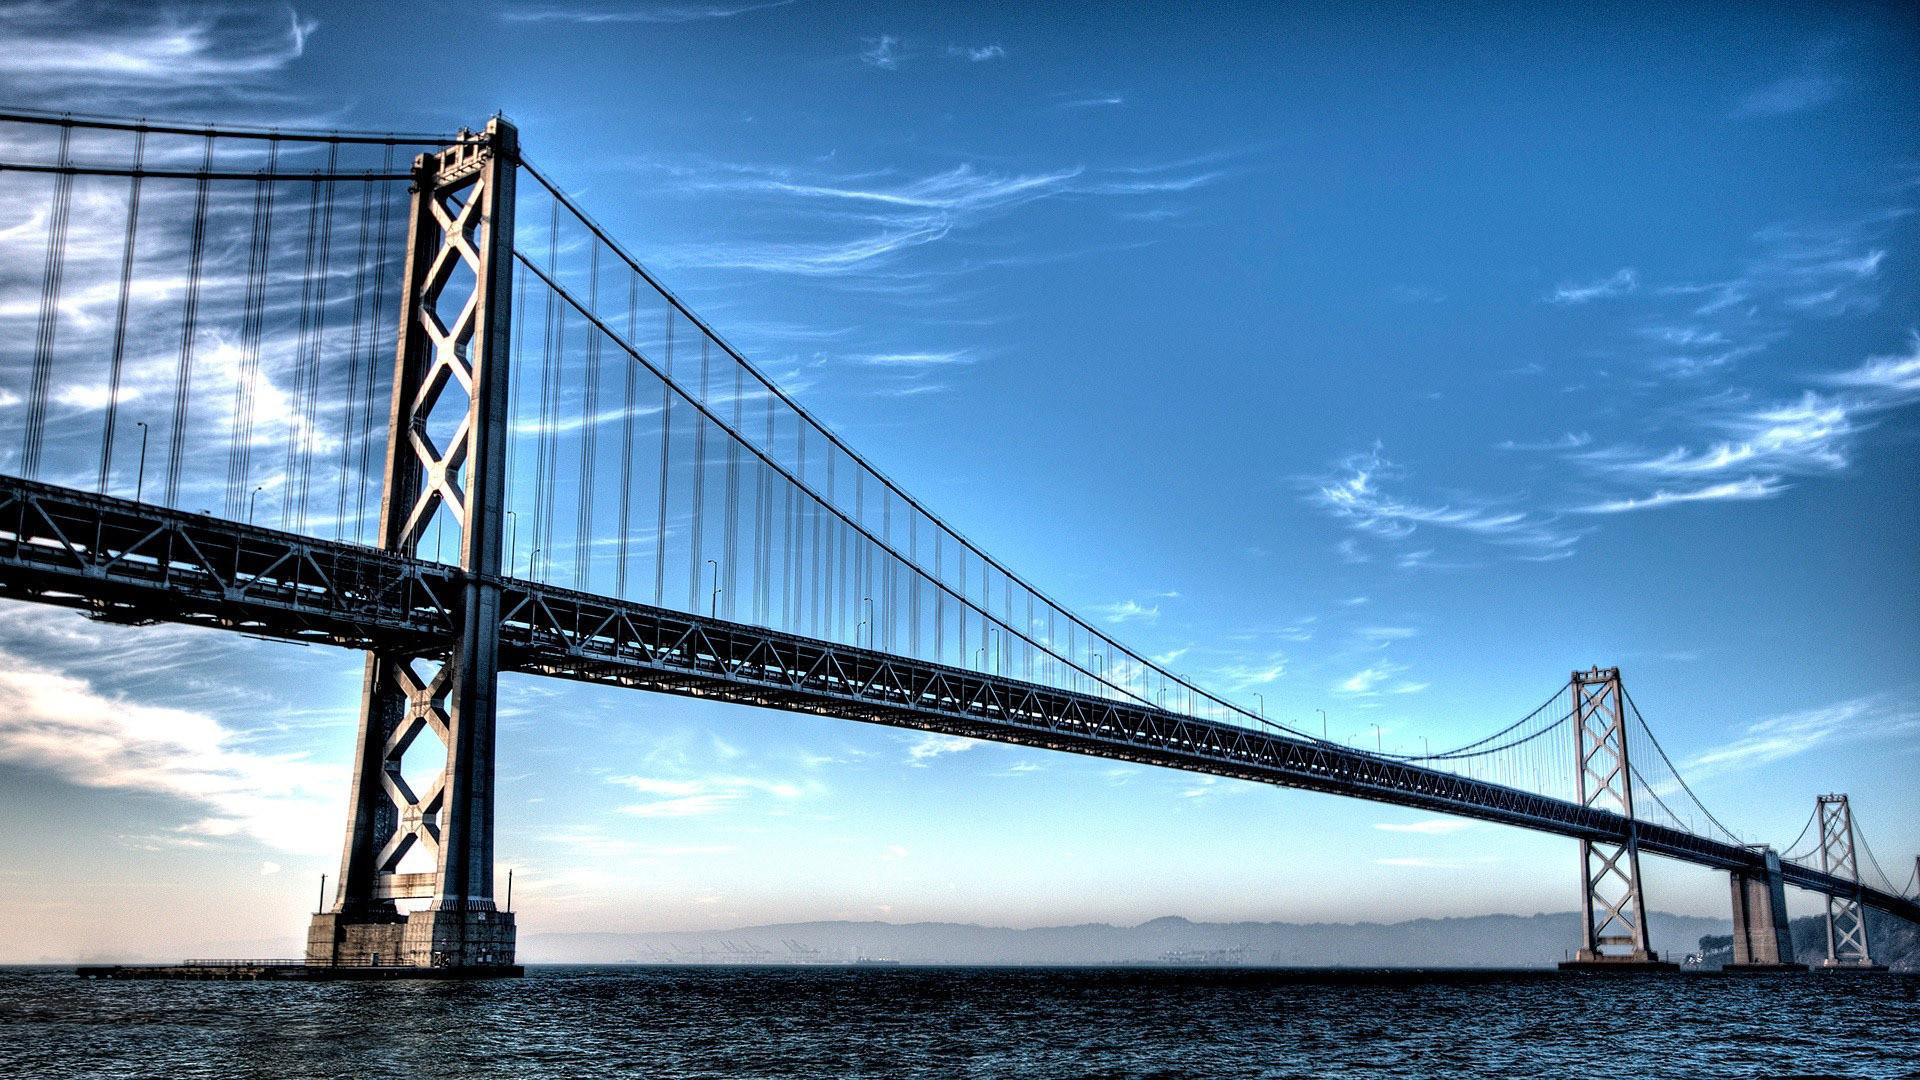 Cool Civil Engineering Wallpaper Backgrounds - San Francisco–oakland Bay Bridge , HD Wallpaper & Backgrounds